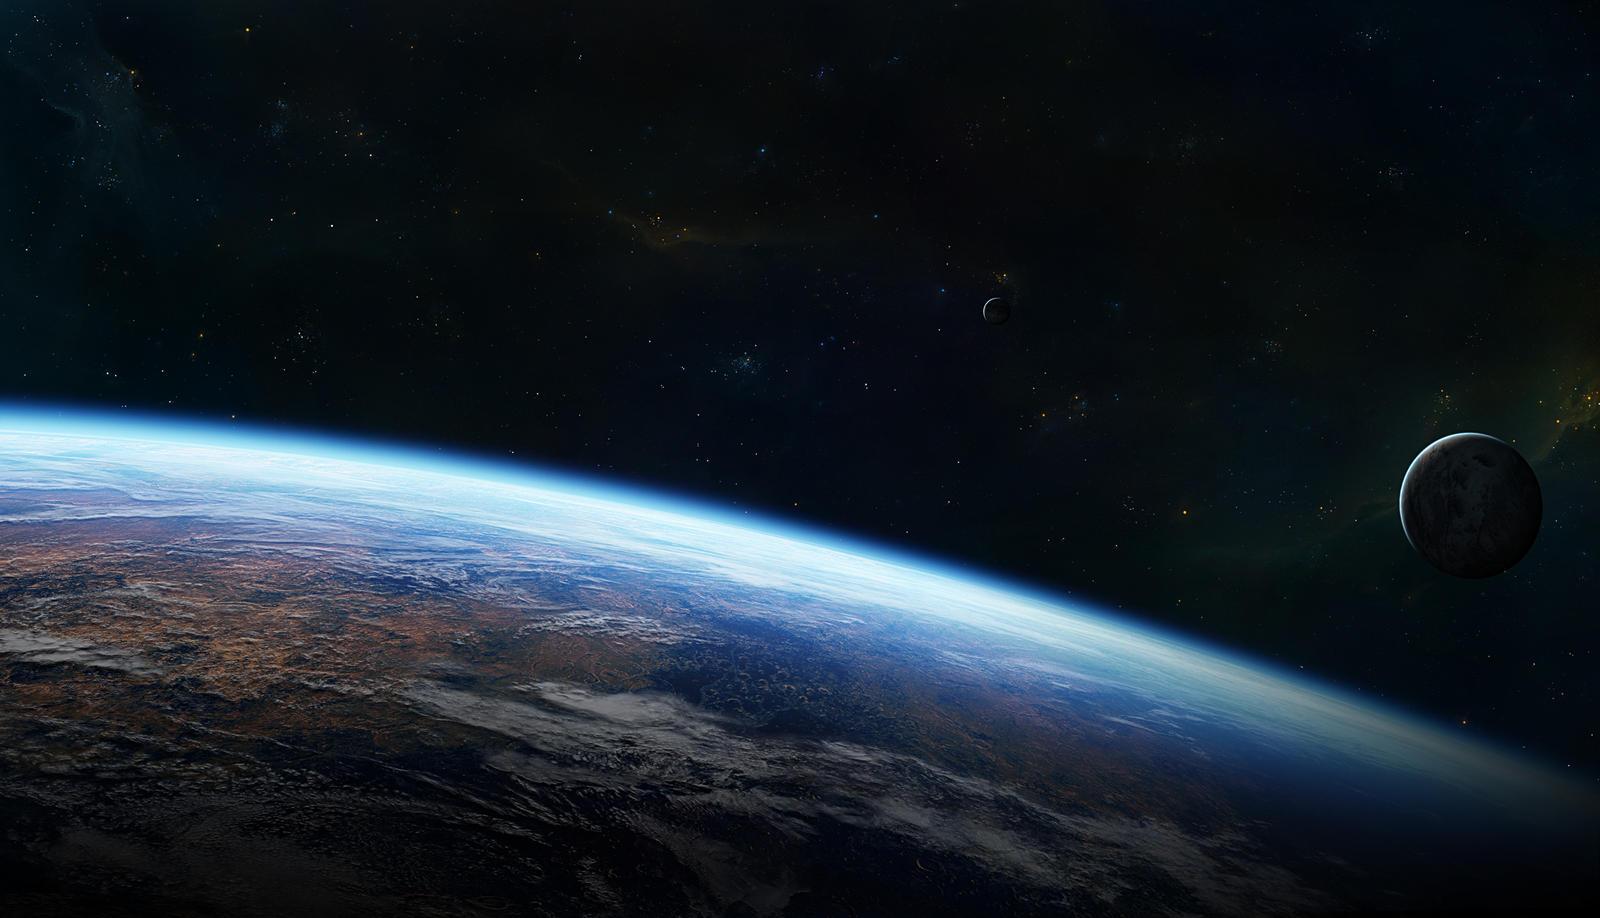 Aerials by TylerCreatesWorlds